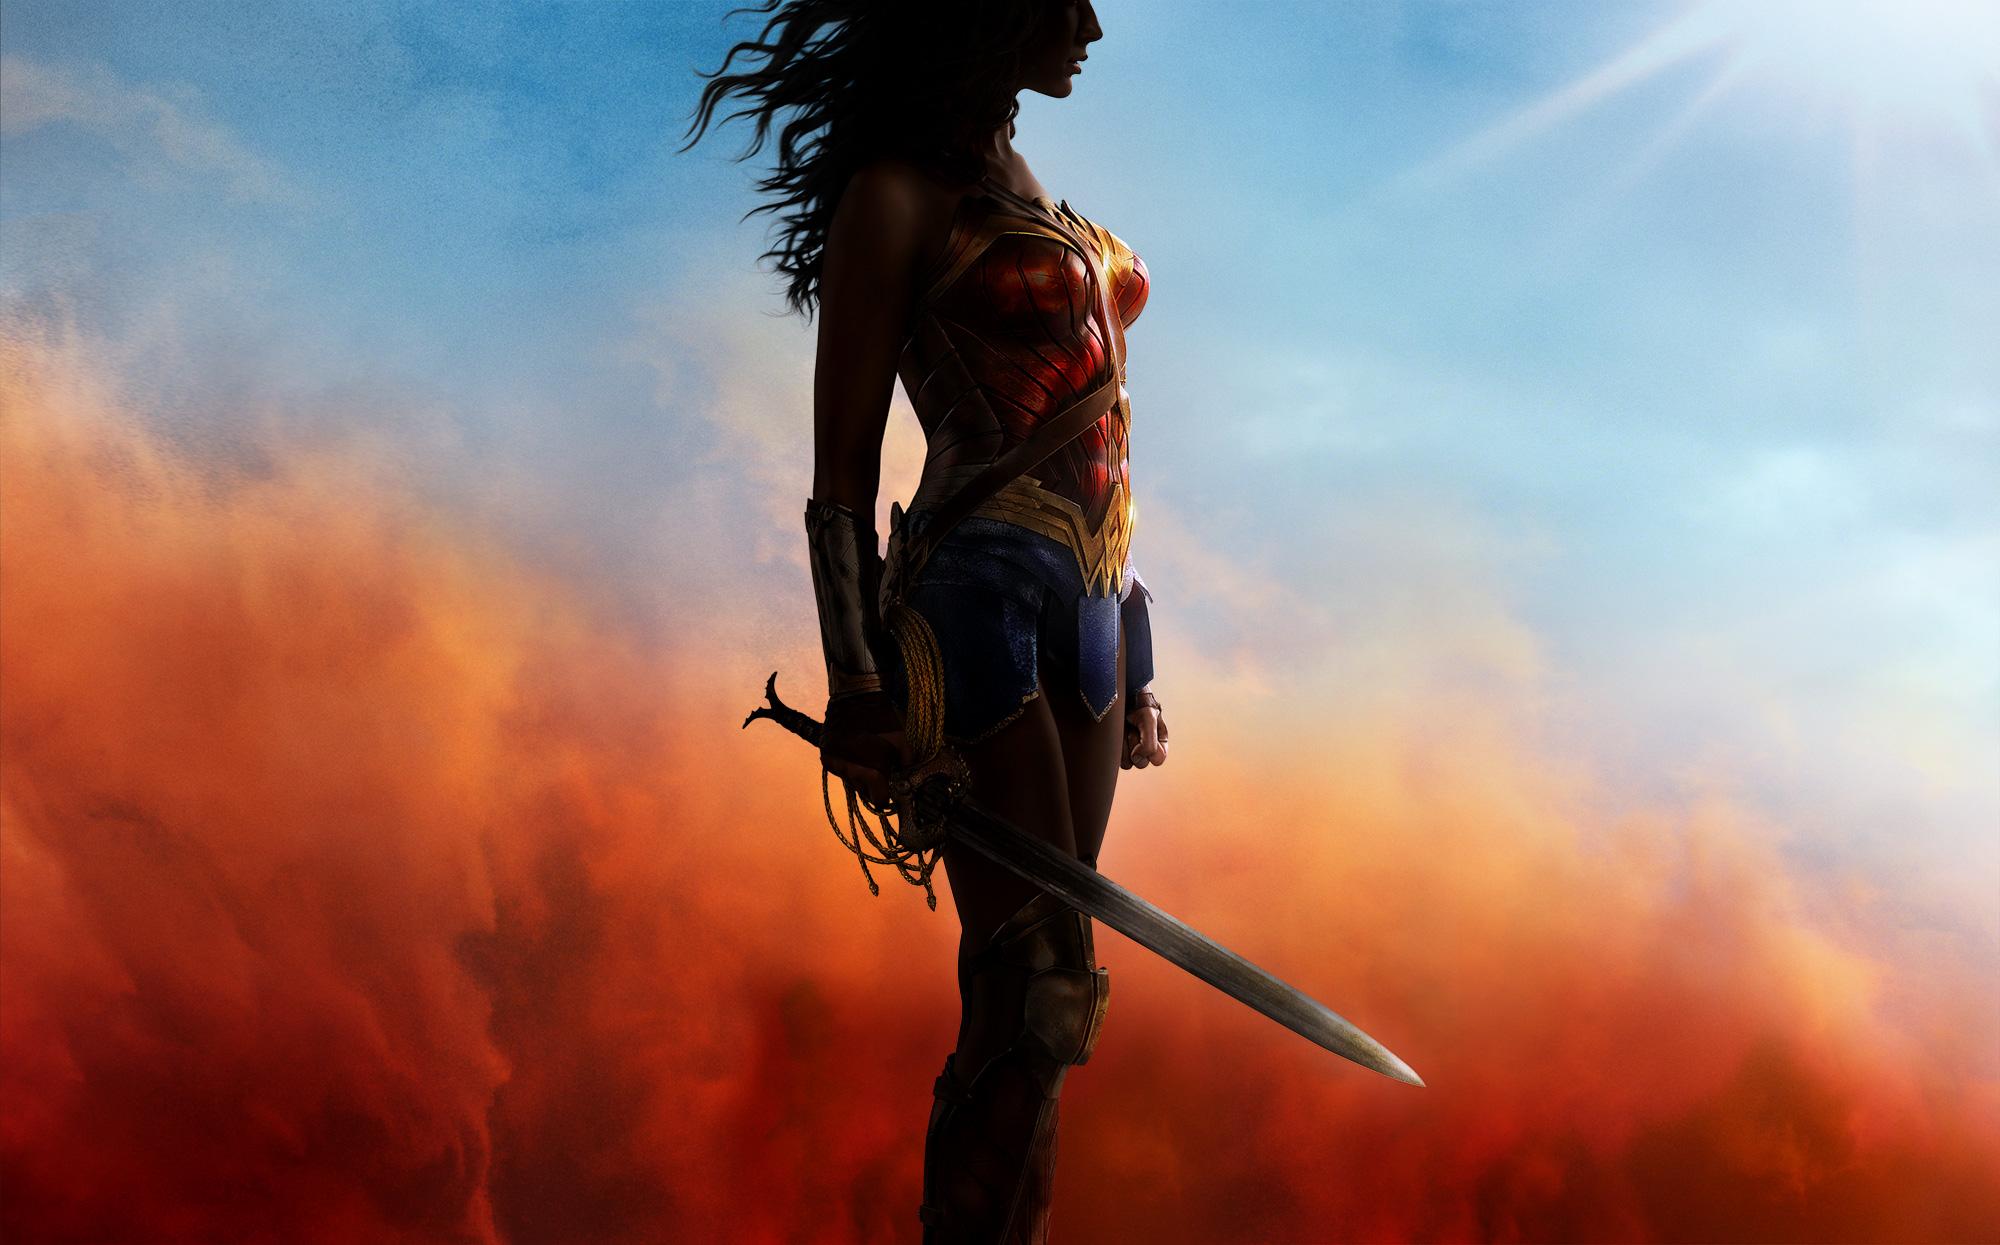 Wonder Woman holding a sword.